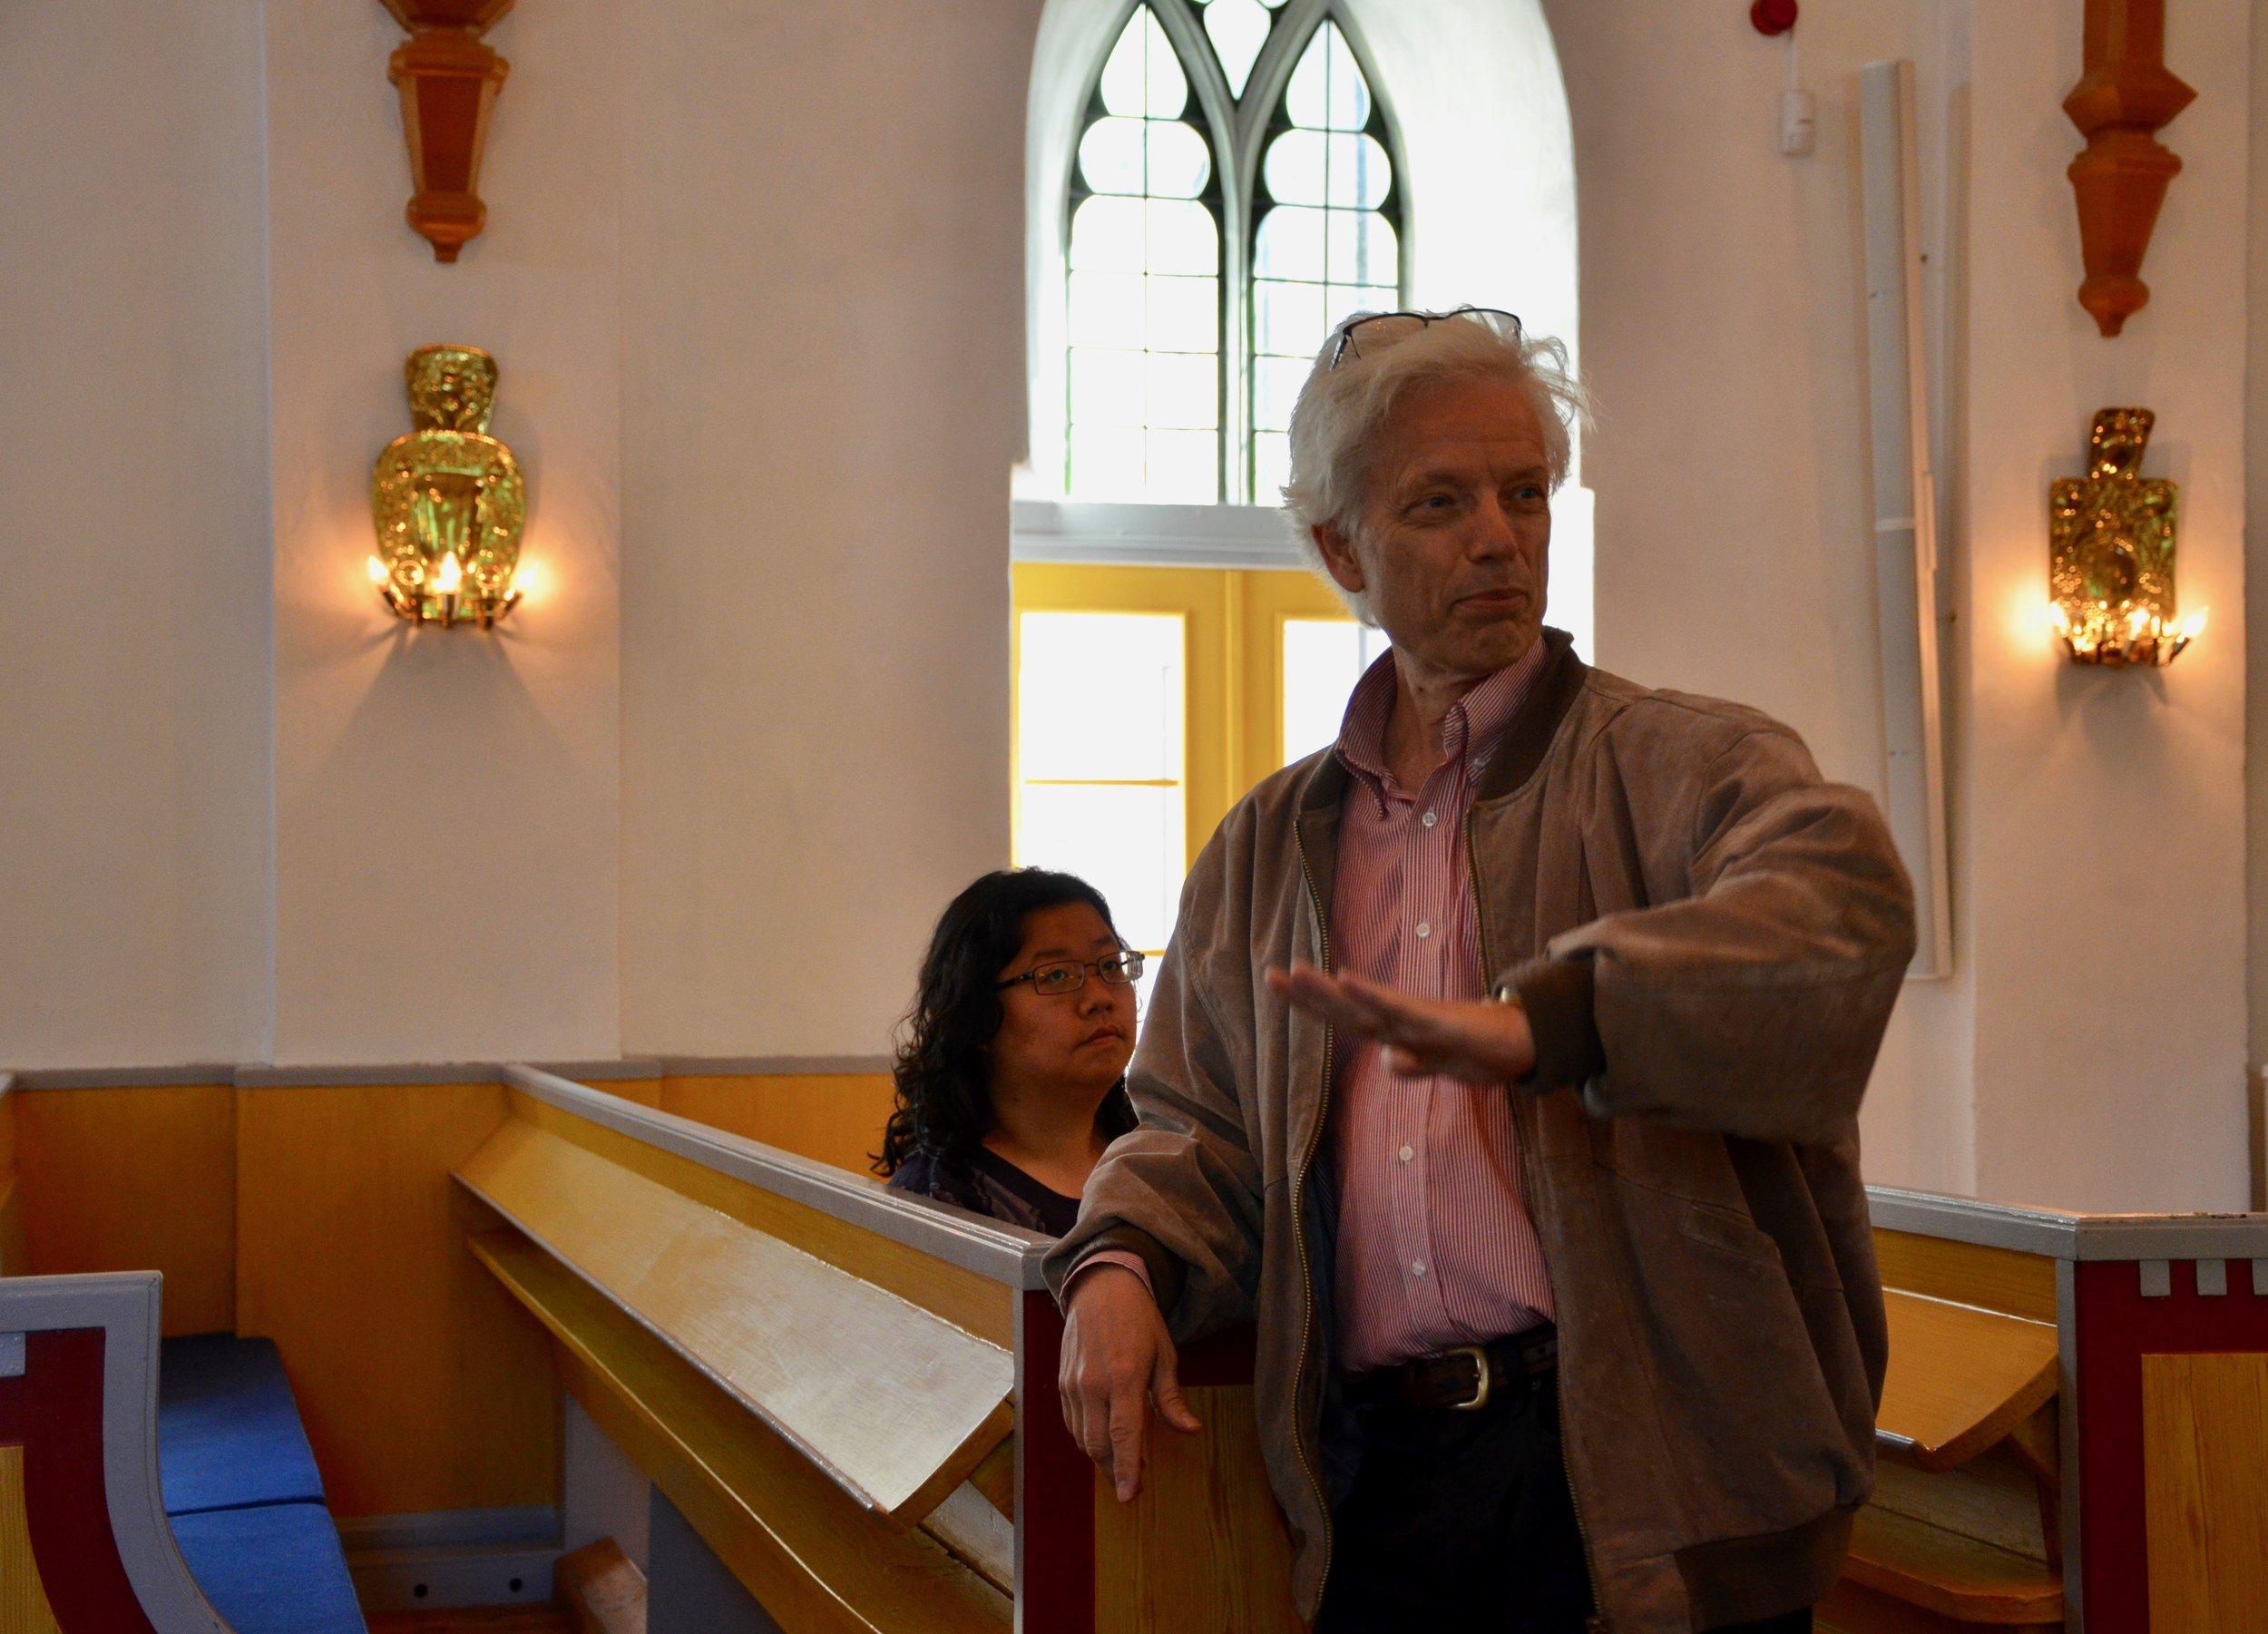 Hans Davidsson introduces the 1783 Schiörlin organ in Jonsered, Sweden.